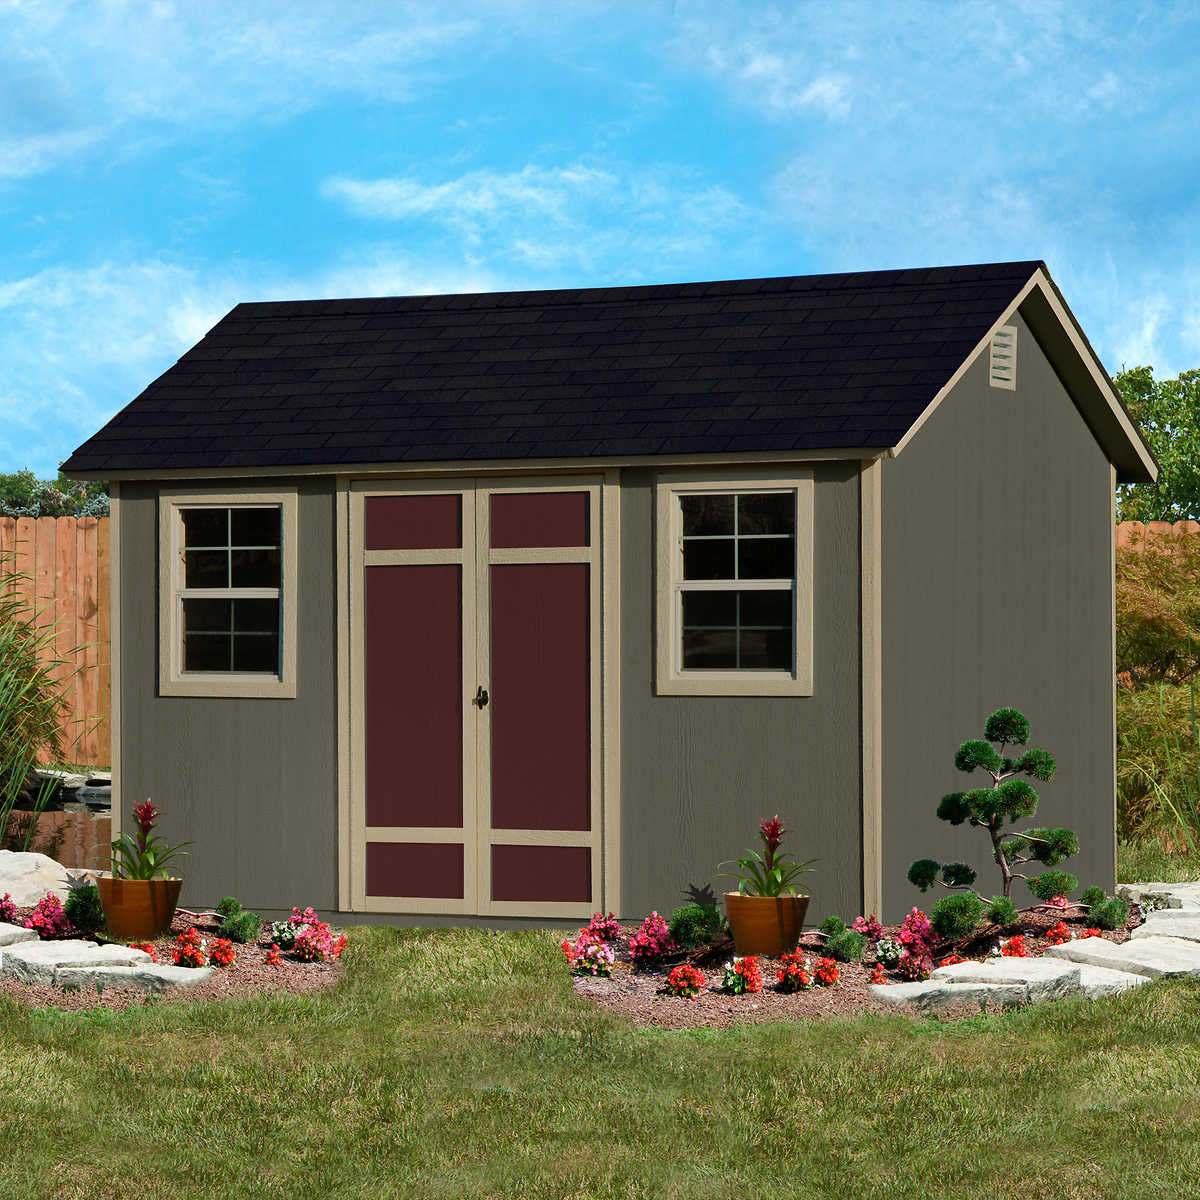 Garden Sheds 6 X 12 wilmington 12' x 8' wood storage shed